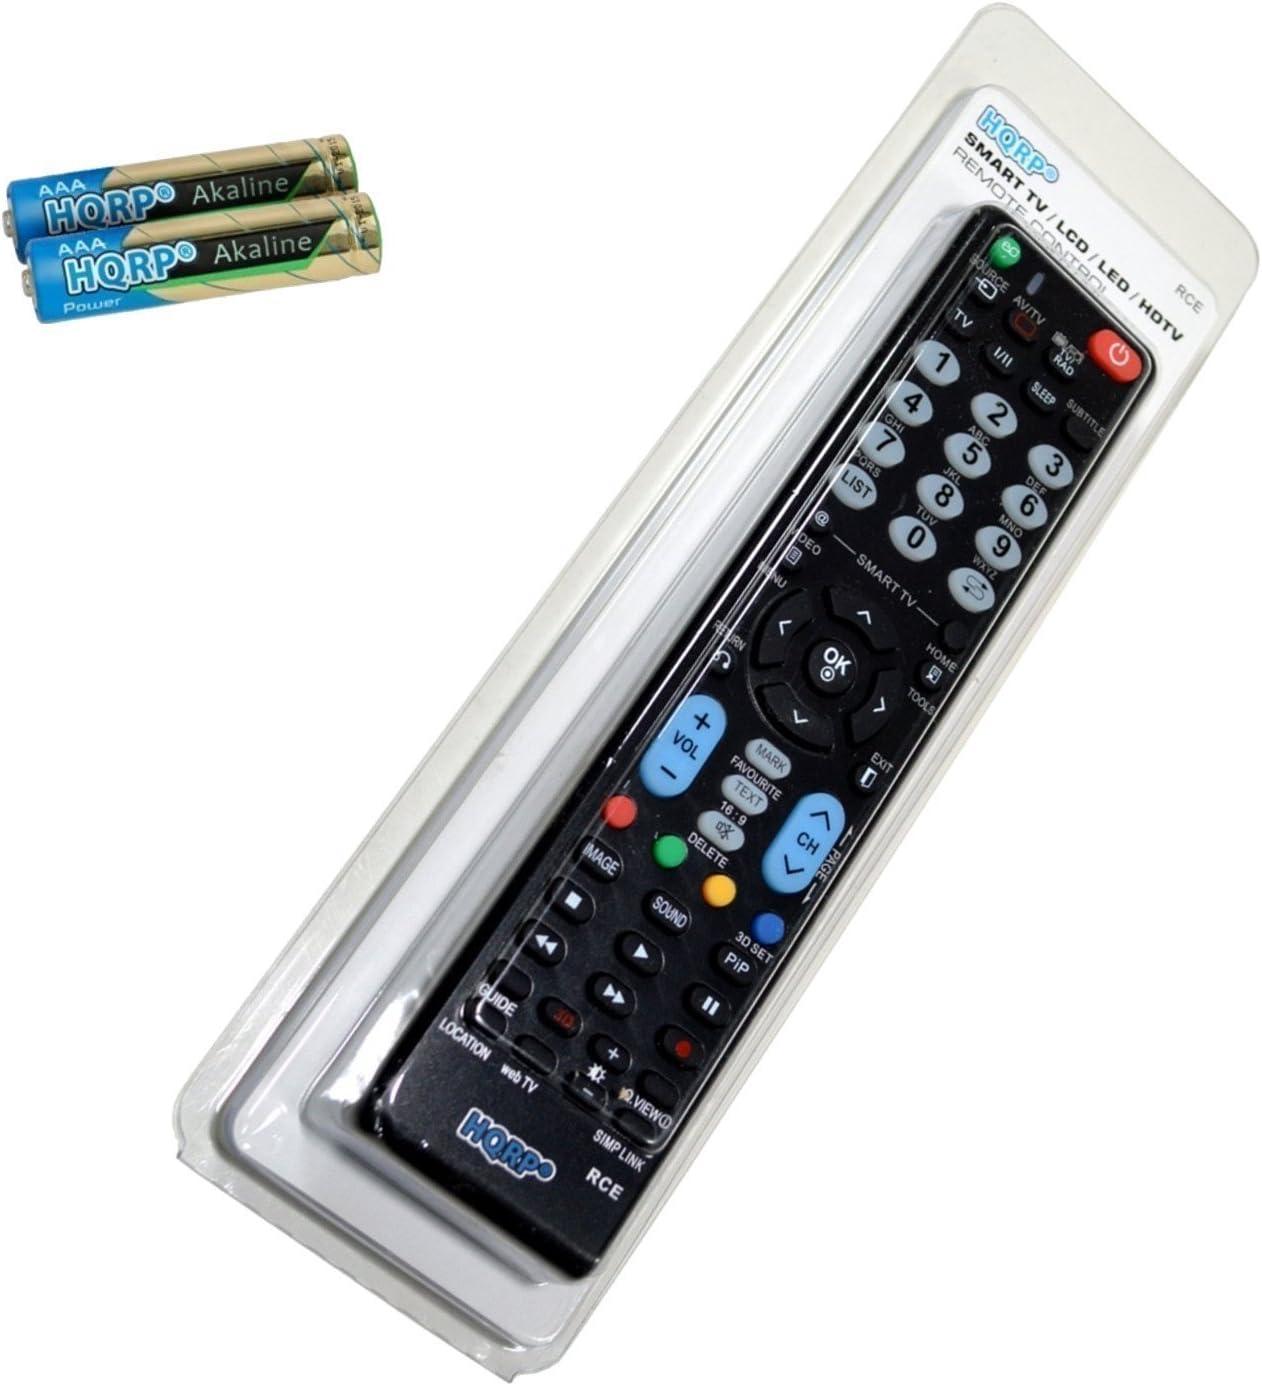 HQRP Mando a Distancia Universal para LG 65EG960V / 55EG960V / 65EF950V / 55EF950V / 55EG920V Televisor UHD (4K) con Smart TV: Amazon.es: Electrónica